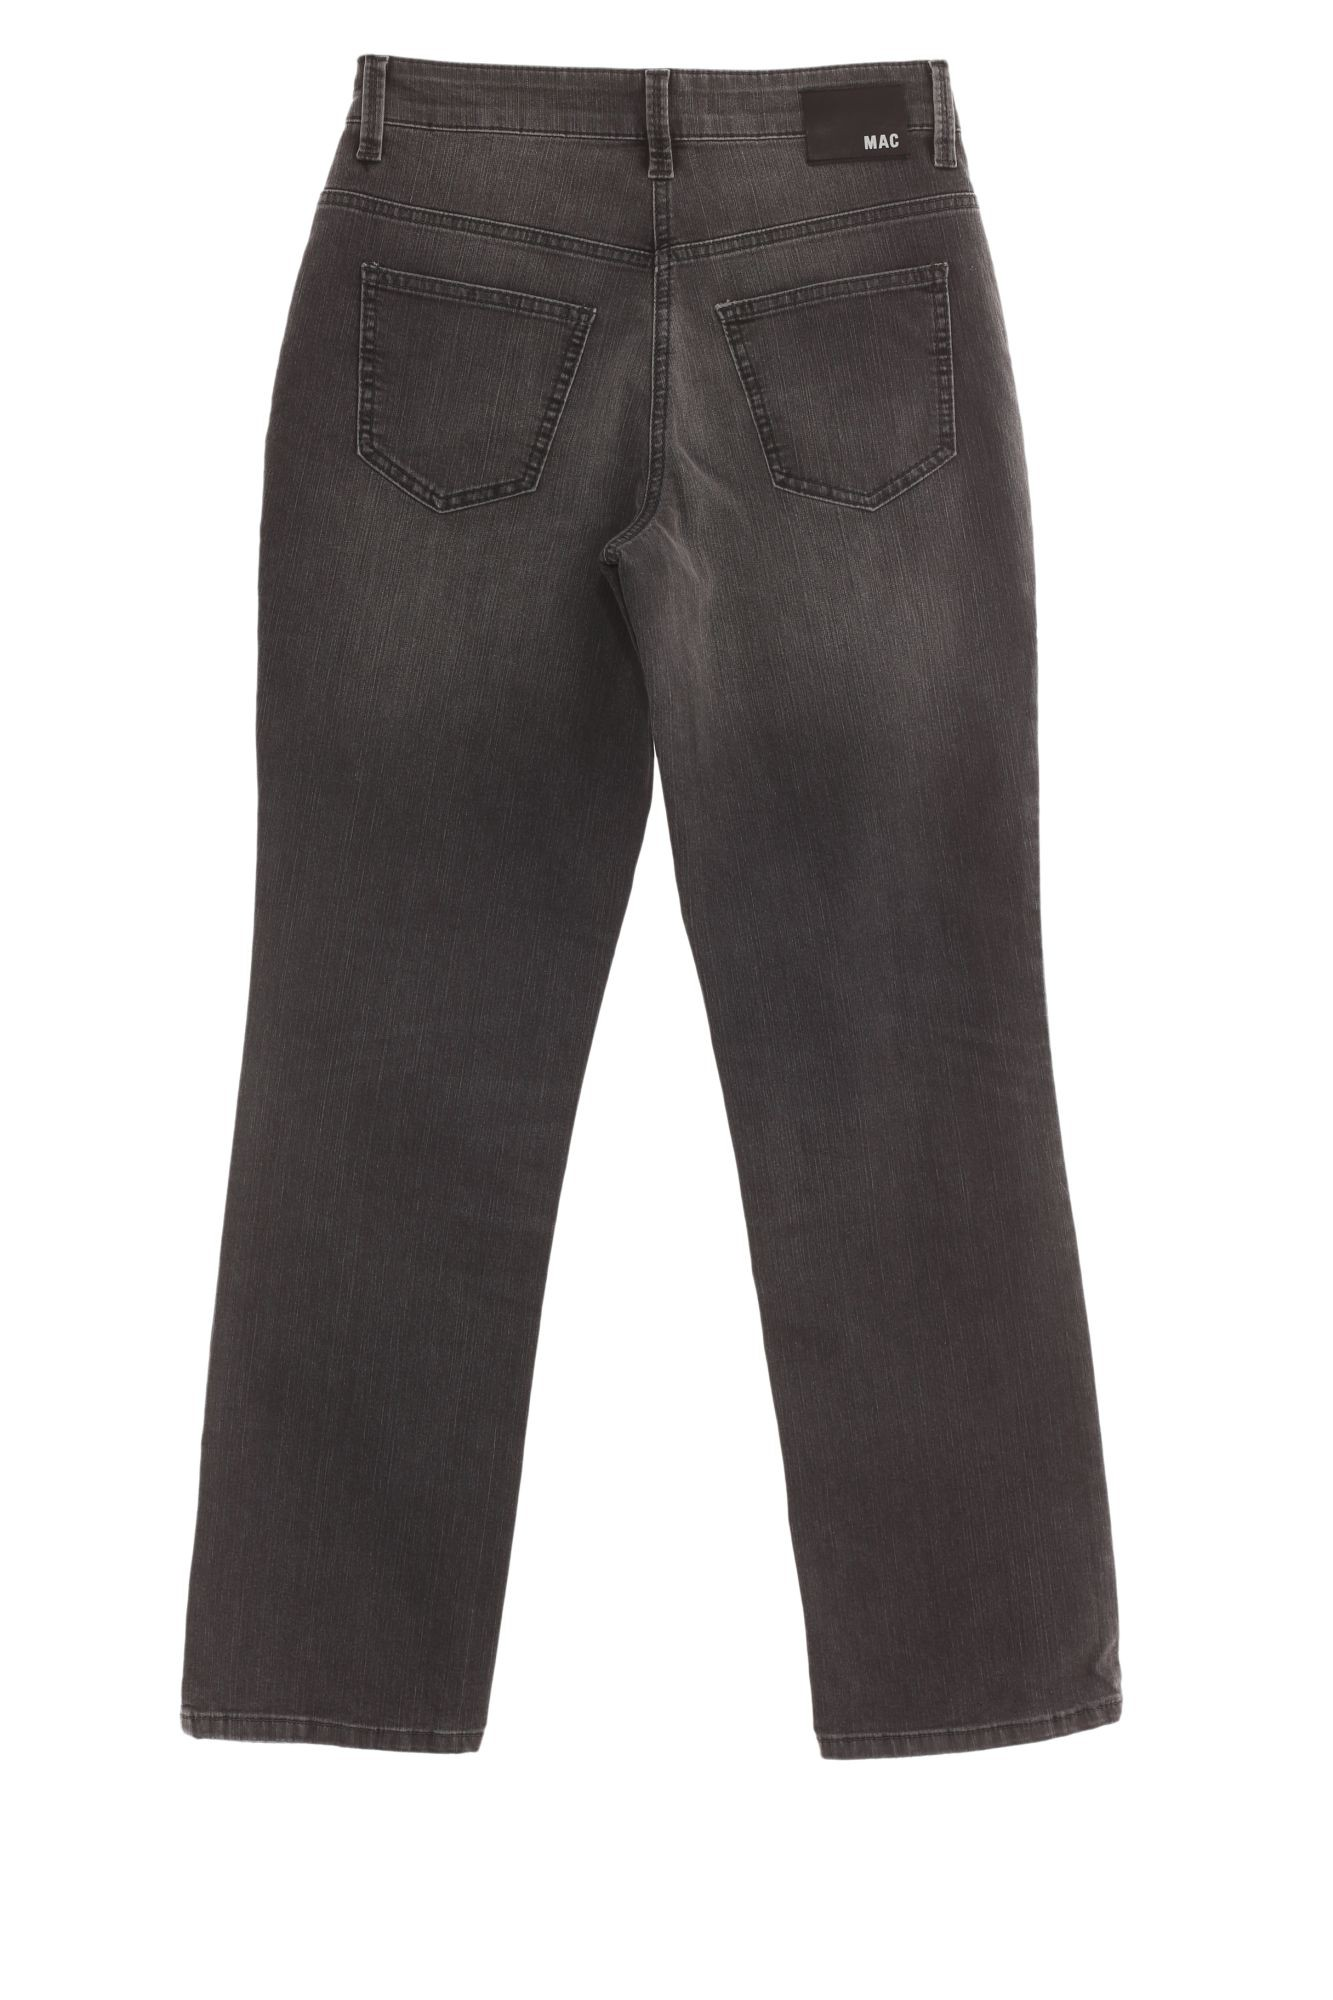 mac jeans melanie damen stretch. Black Bedroom Furniture Sets. Home Design Ideas